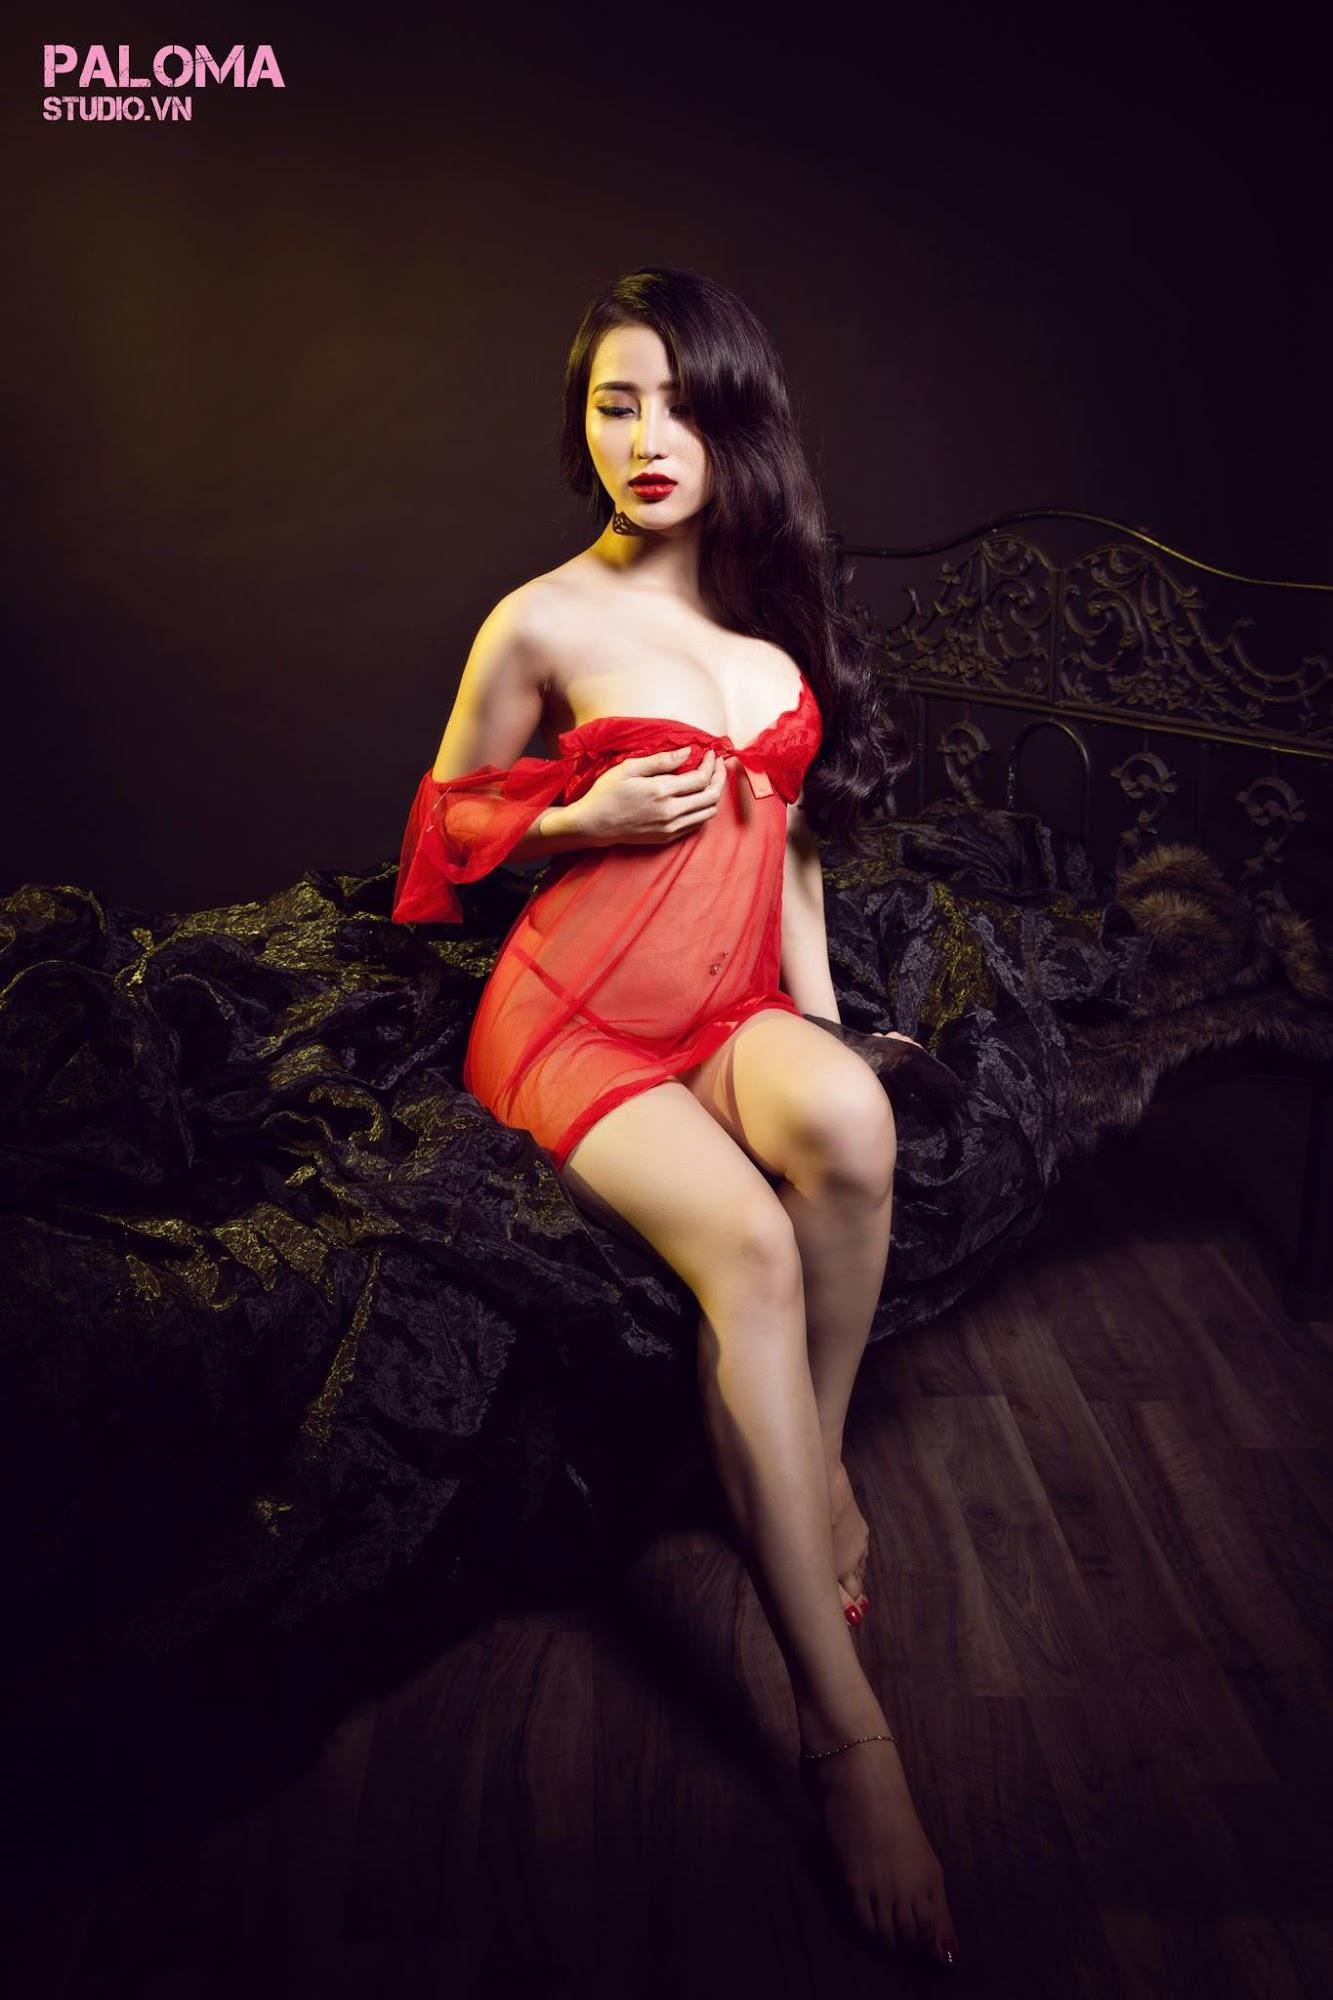 Archived: Hoang Thi Phu – VietNam Sexy Model